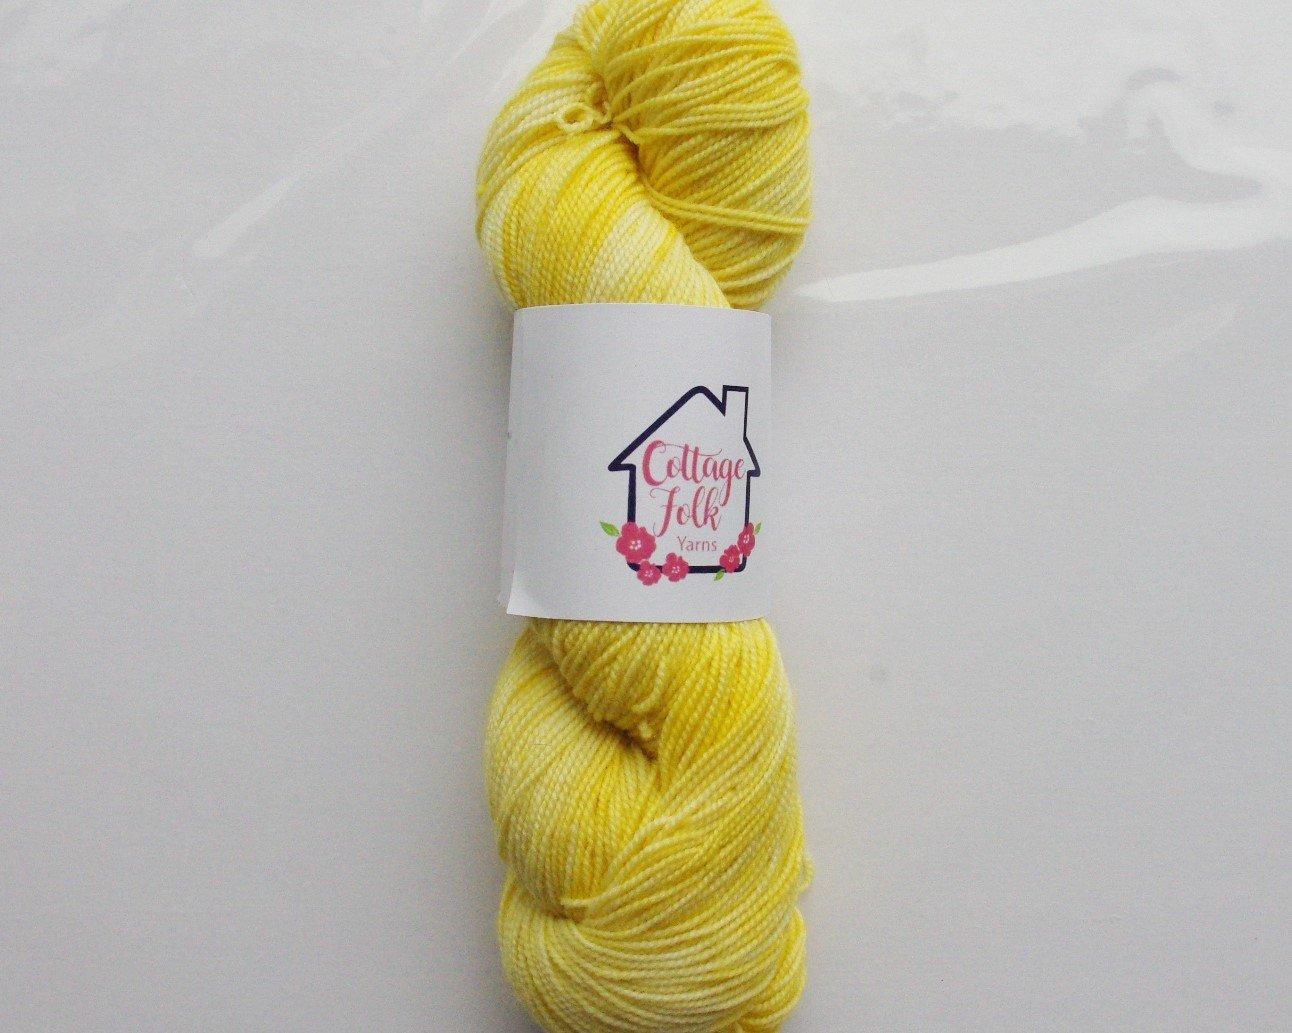 Cottage Folk Yarns, Old Reliable